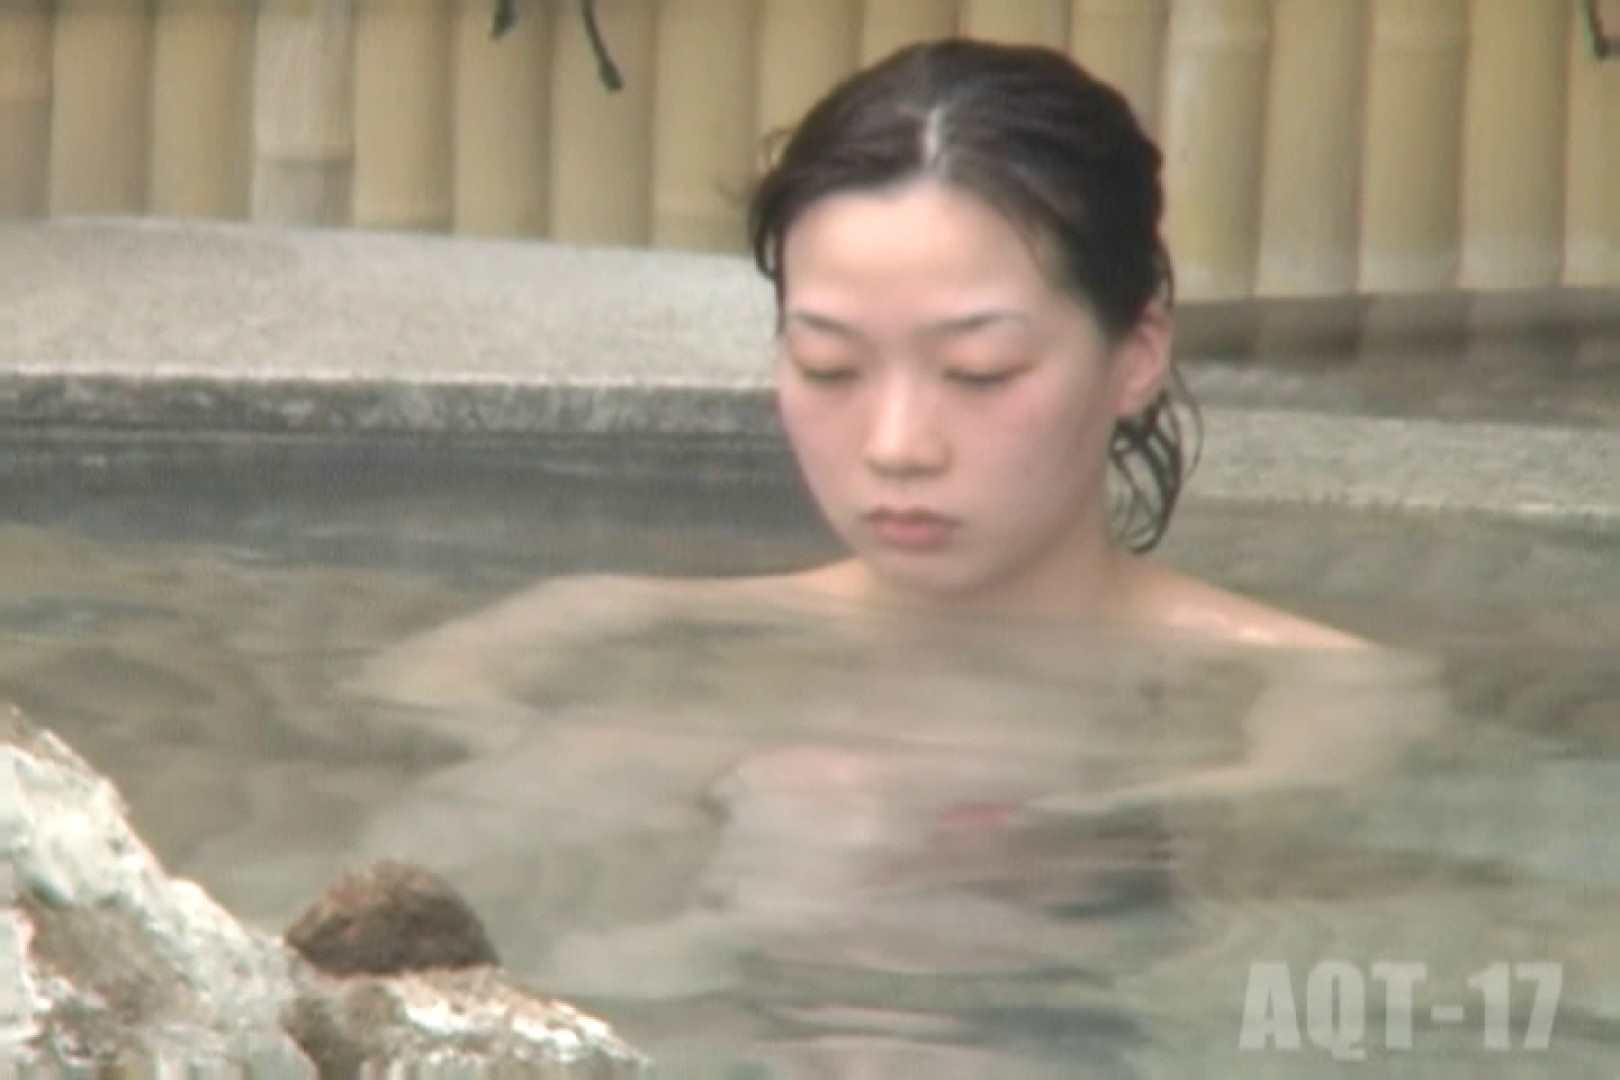 Aquaな露天風呂Vol.848 盗撮師作品  86pic 27